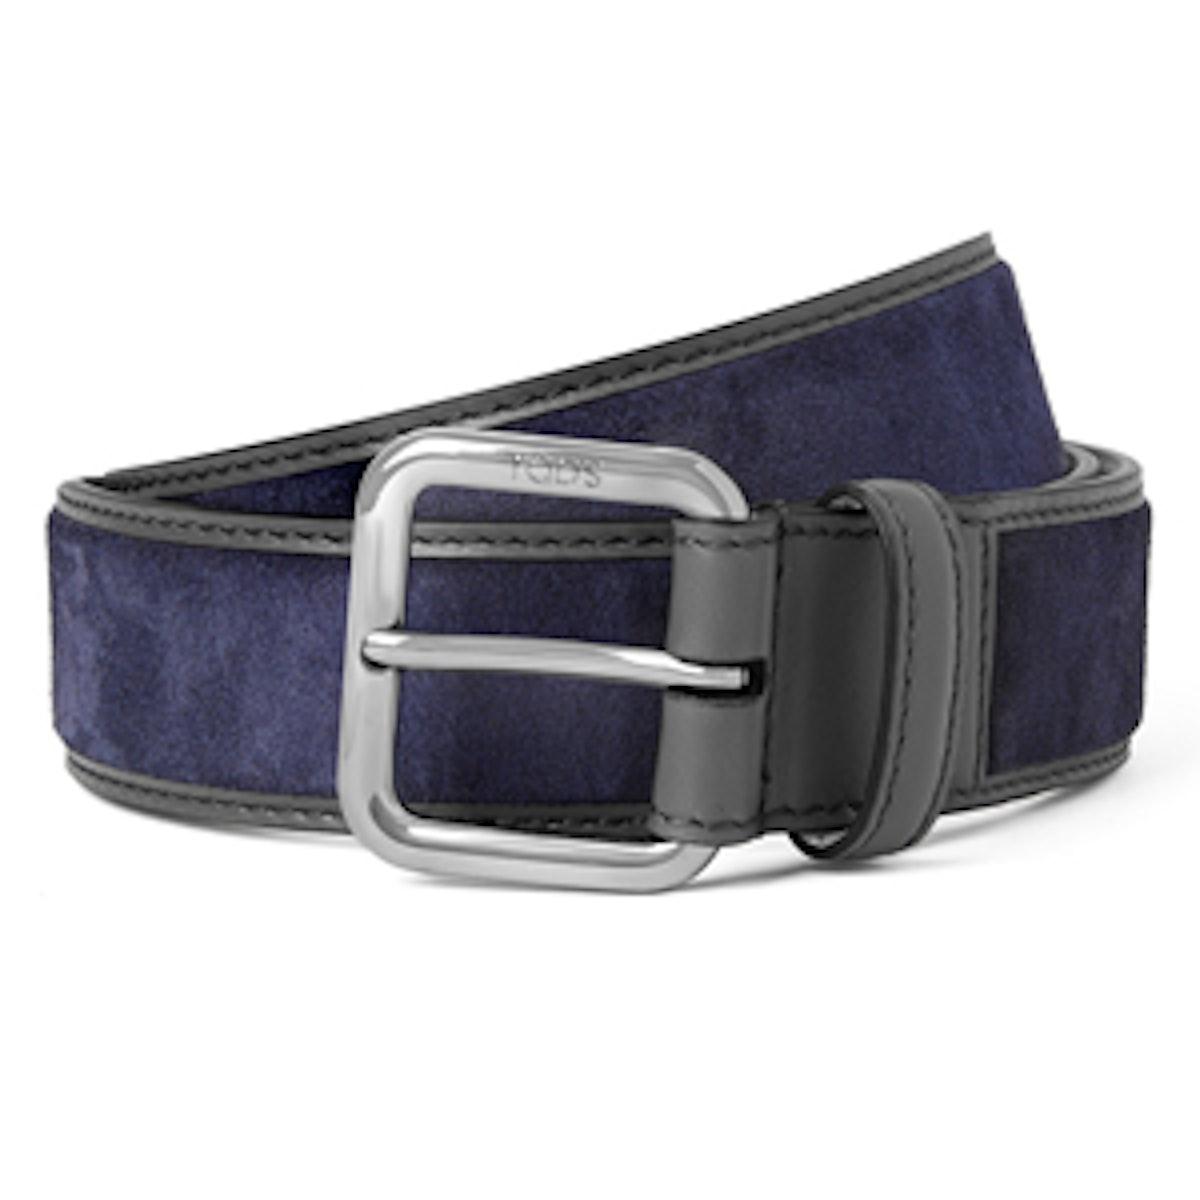 Leather Trimmed Suede Belt